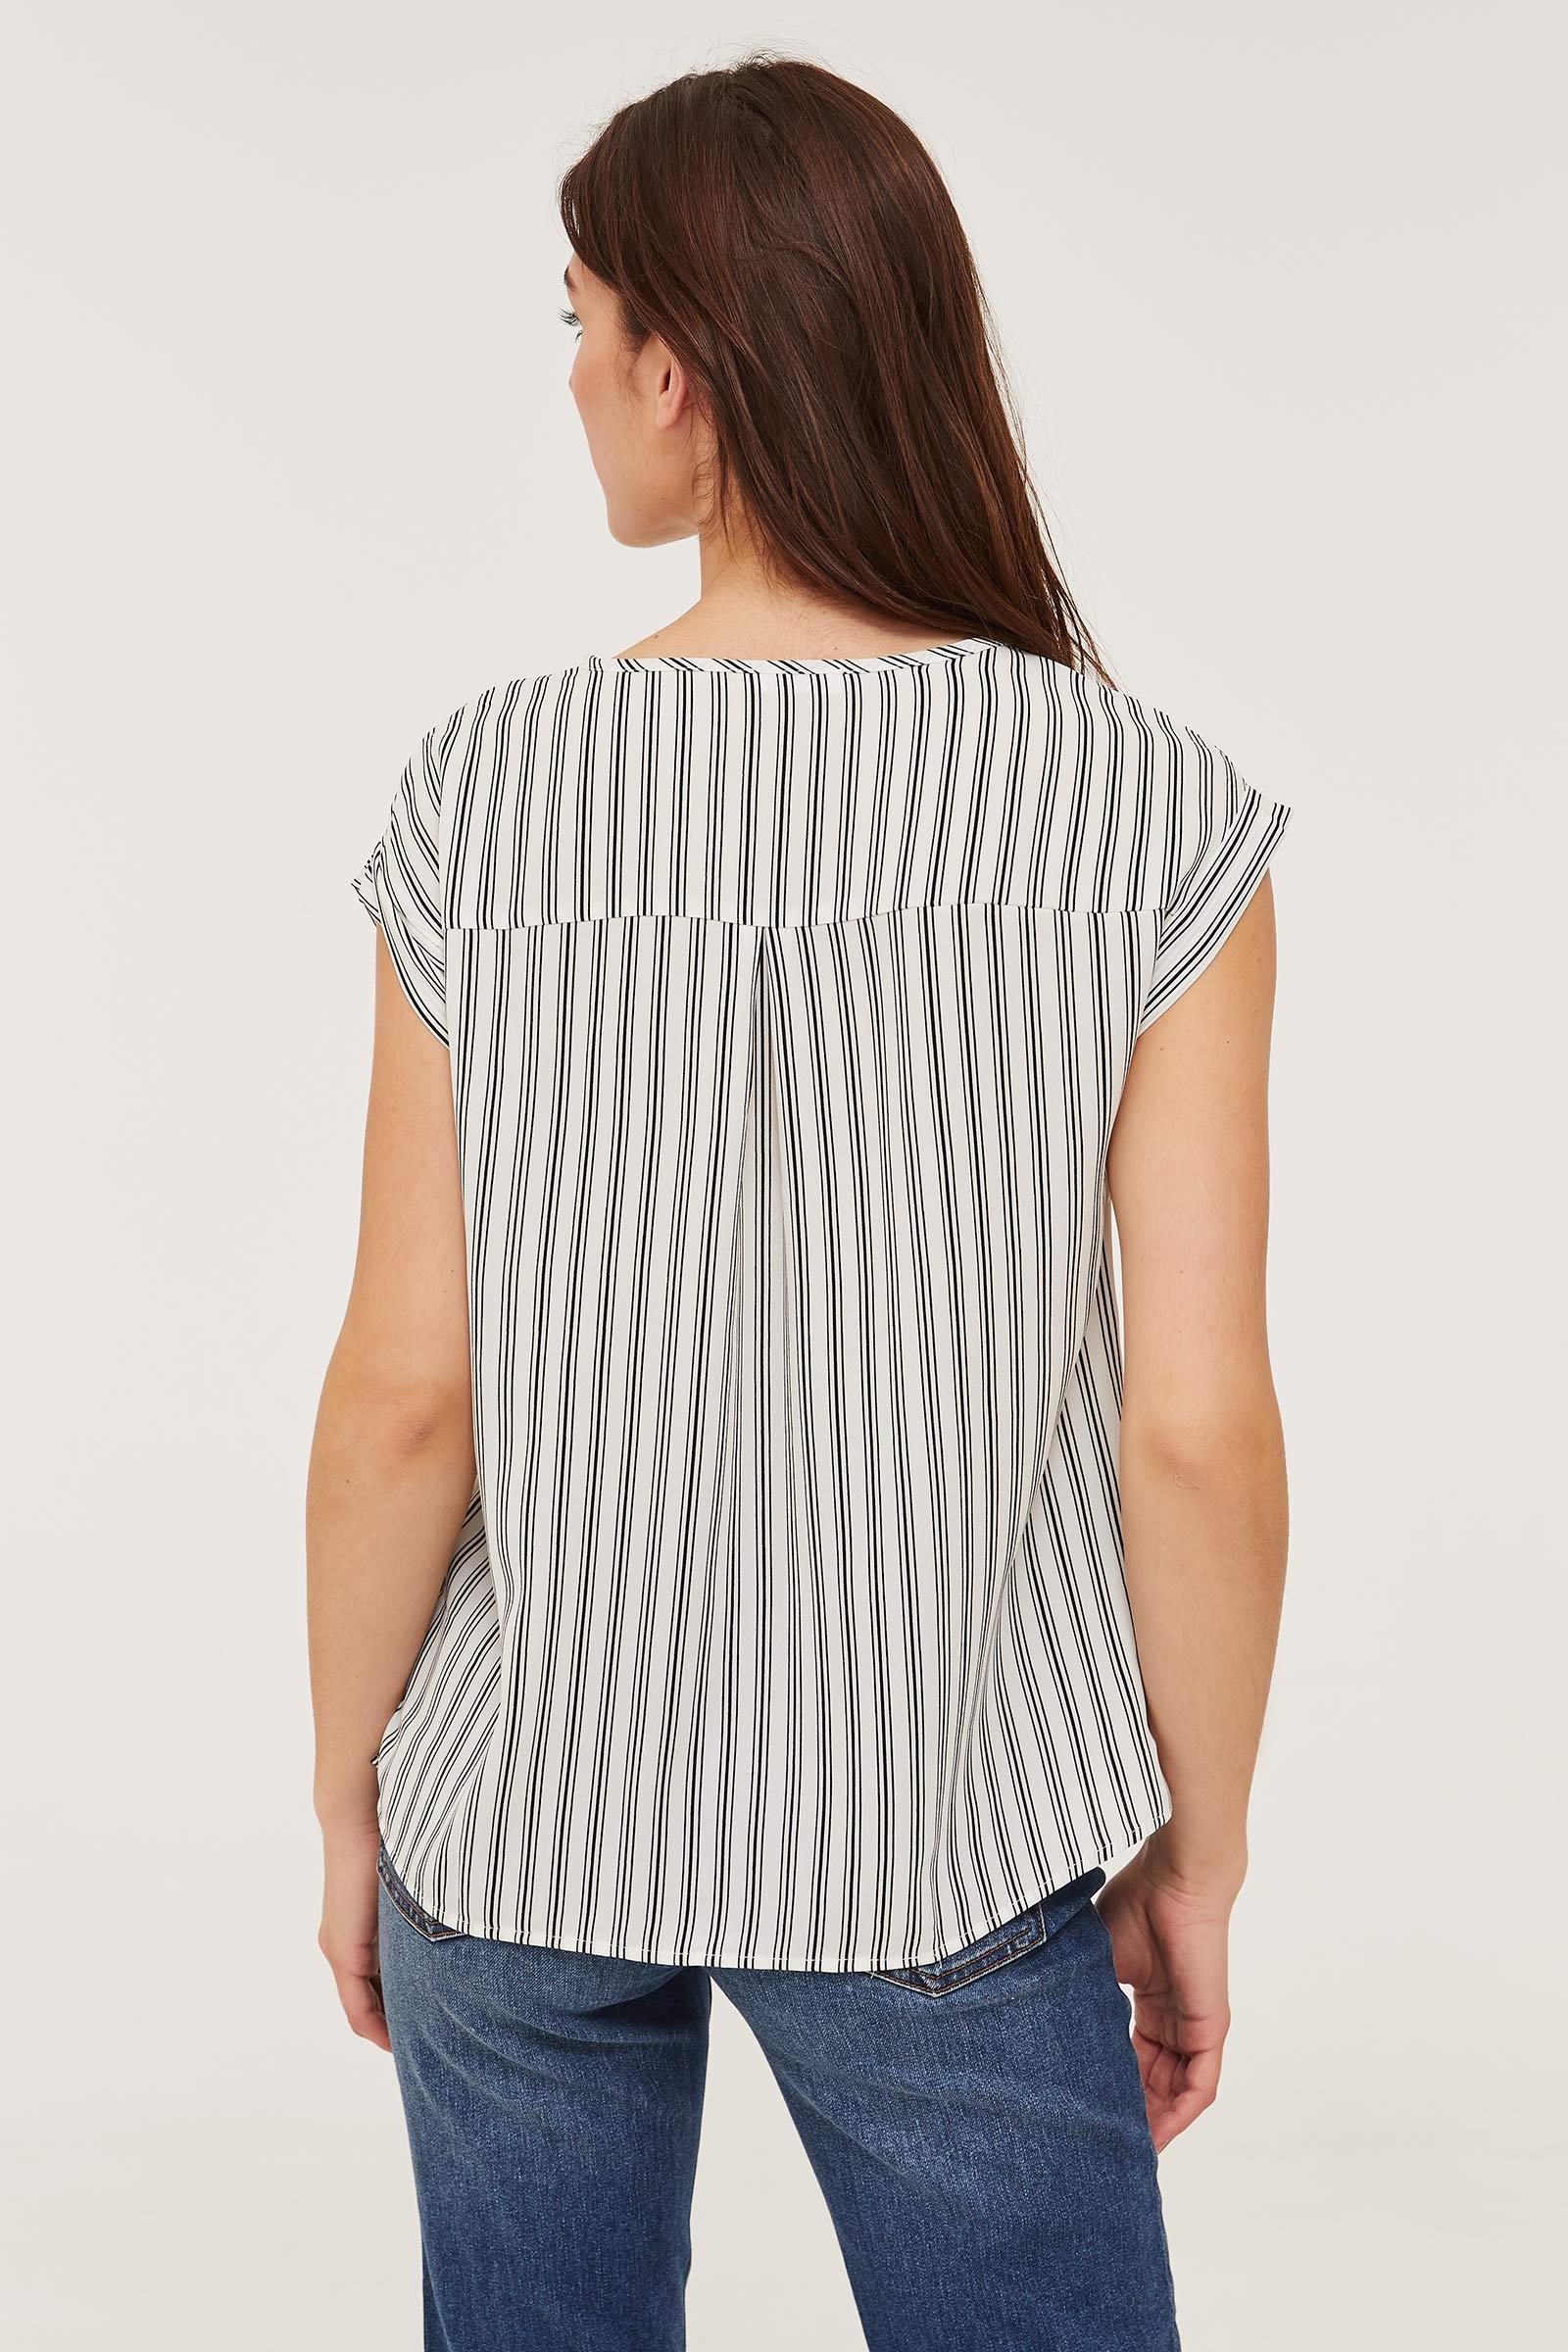 Striped Cap Sleeve Top